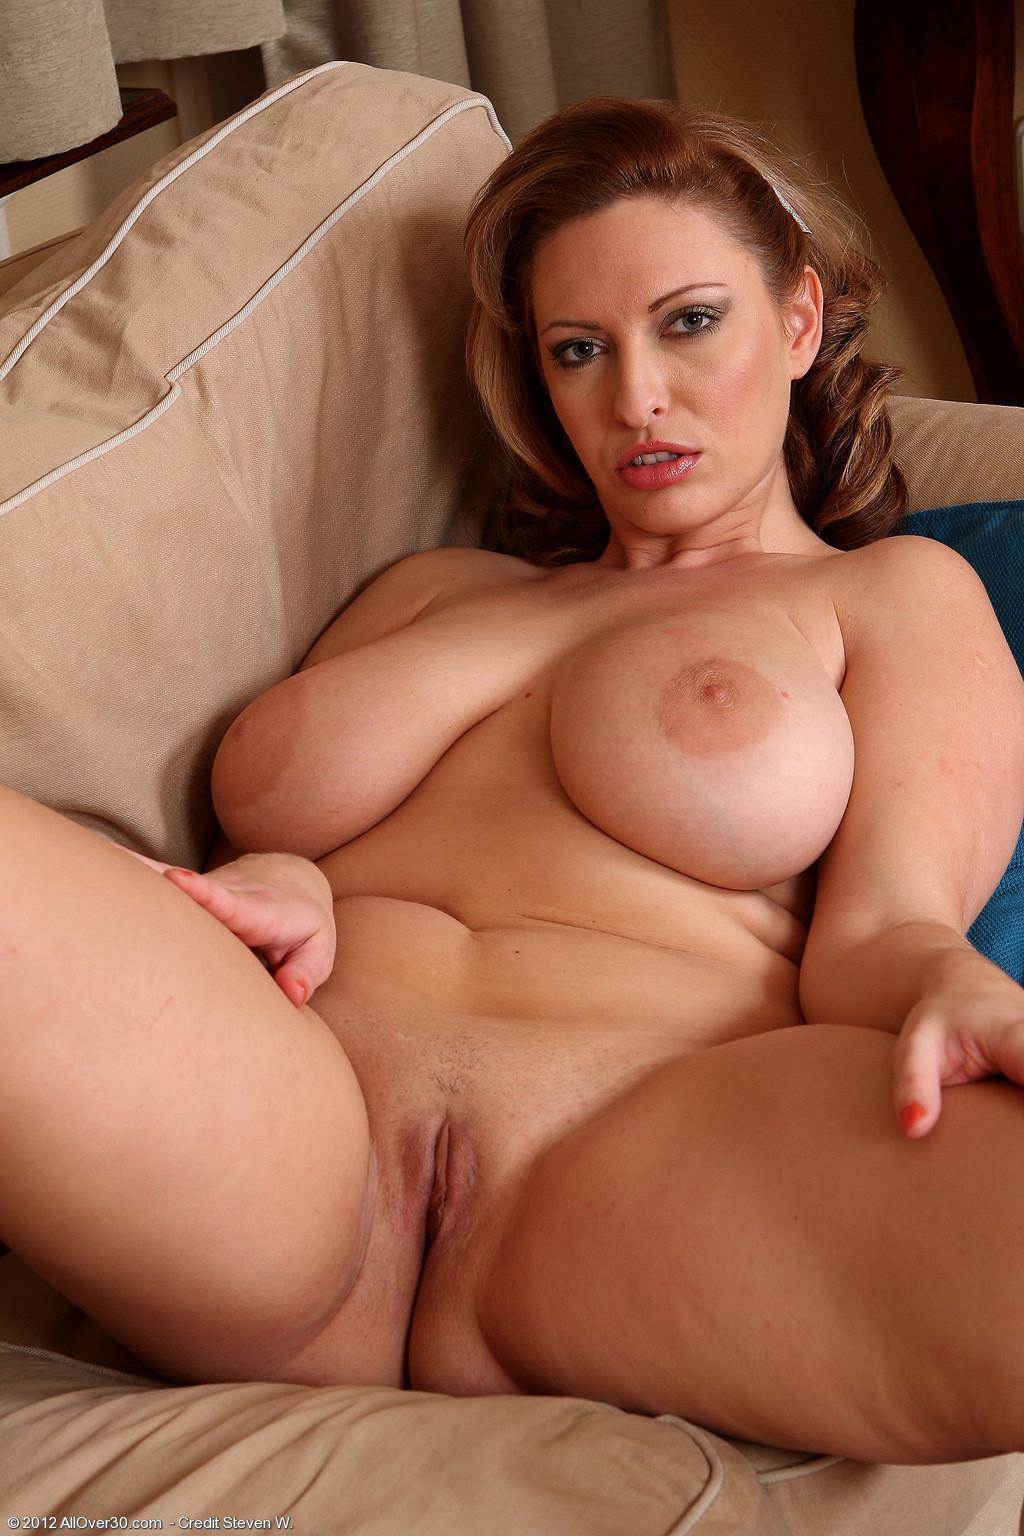 Big tit women pics